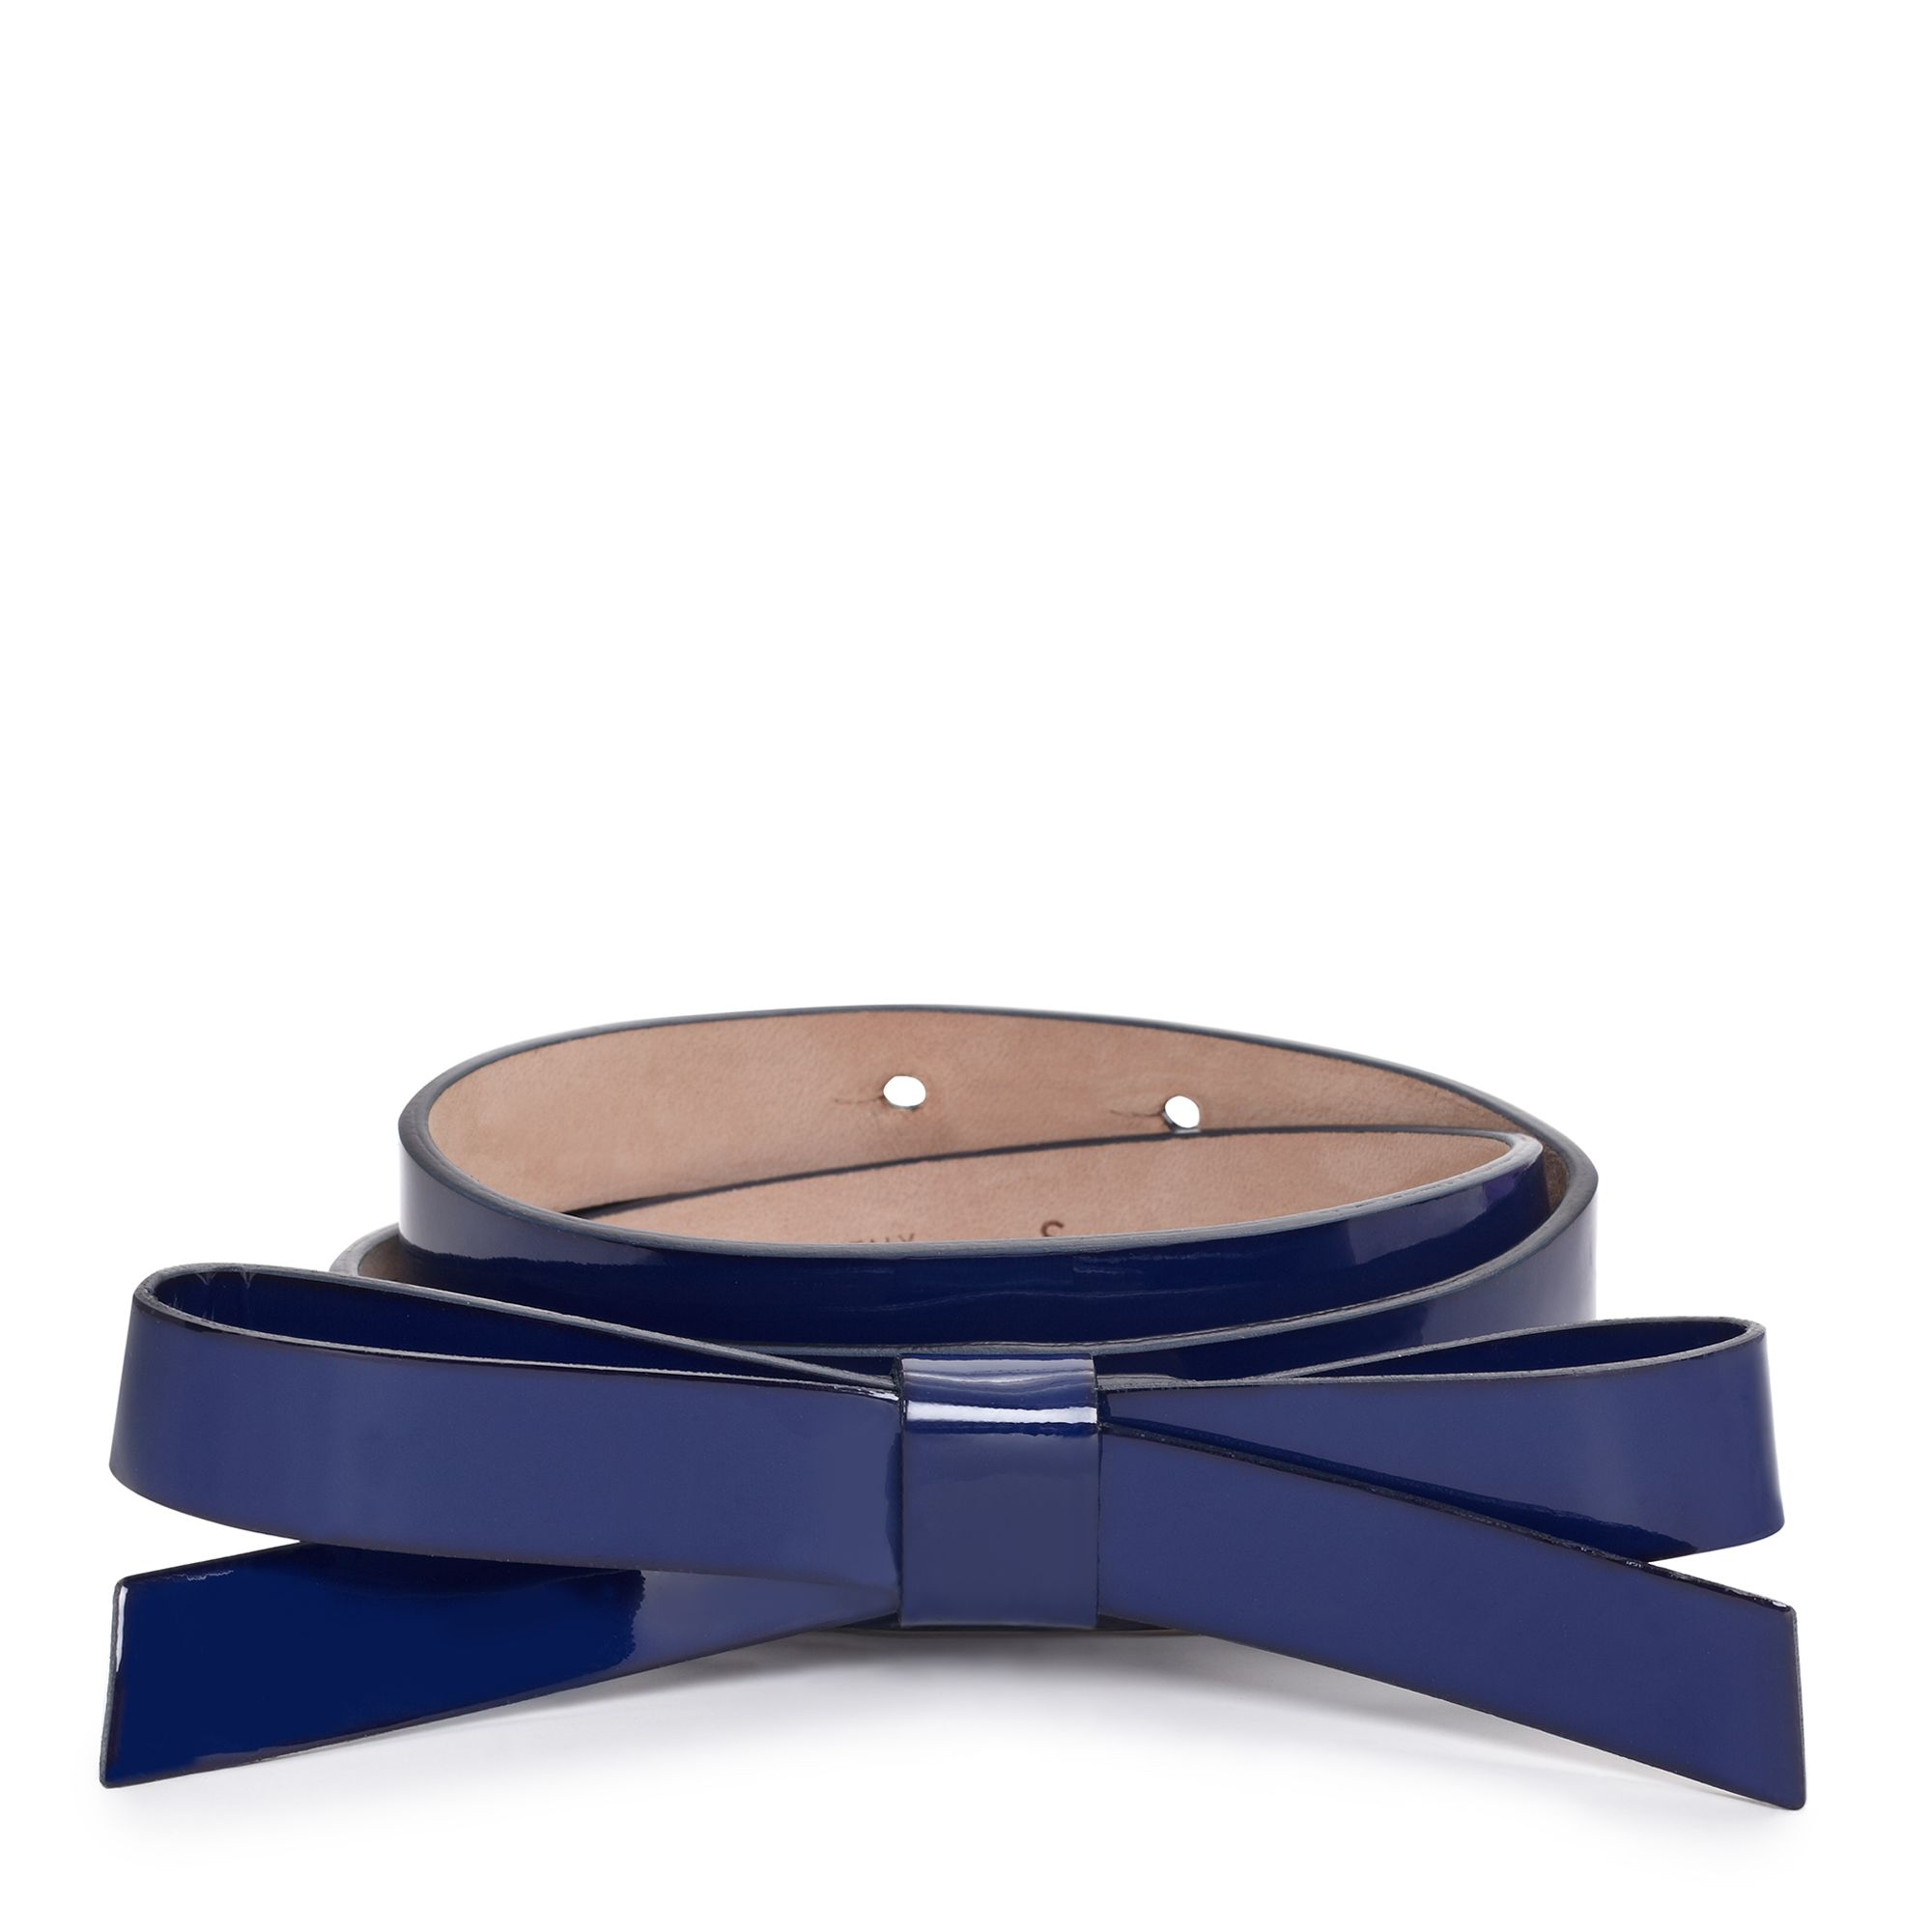 Kate Spade Bow Belt - Cobalt Blue